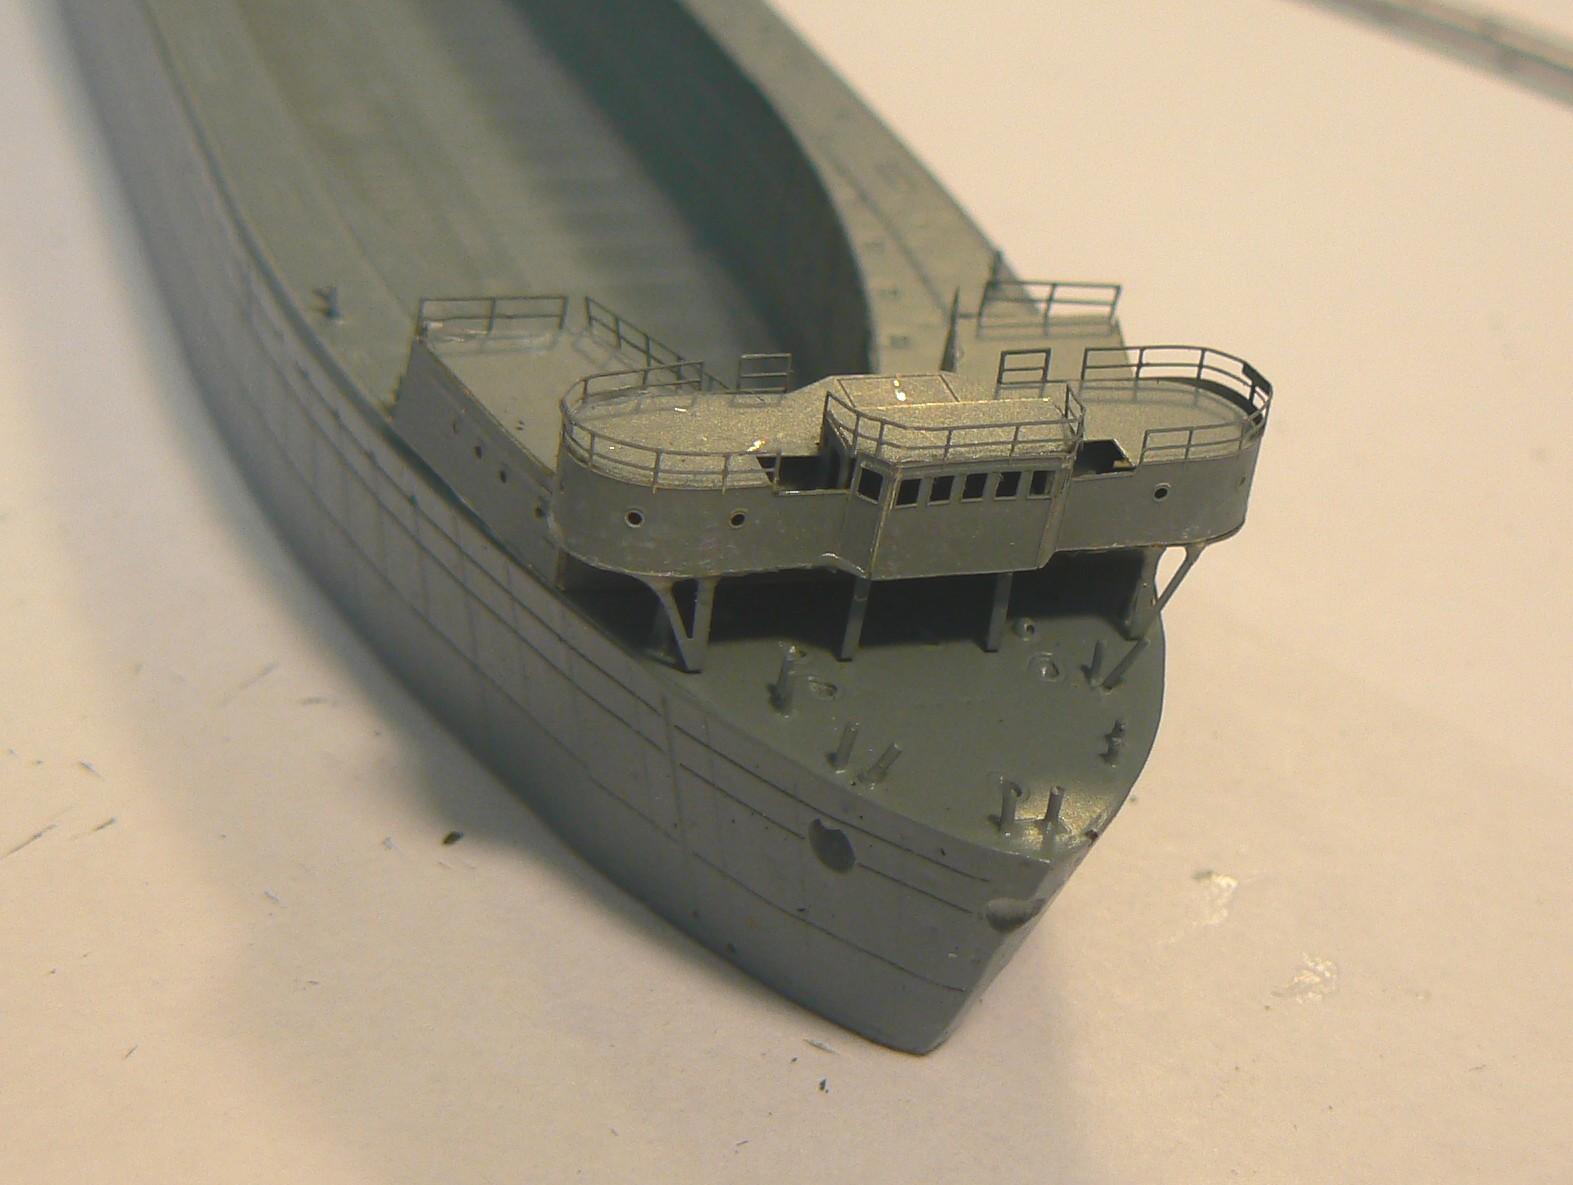 MARE ISLAND NAVAL SHIP YARD  1/700 - Page 2 8CH7Ra